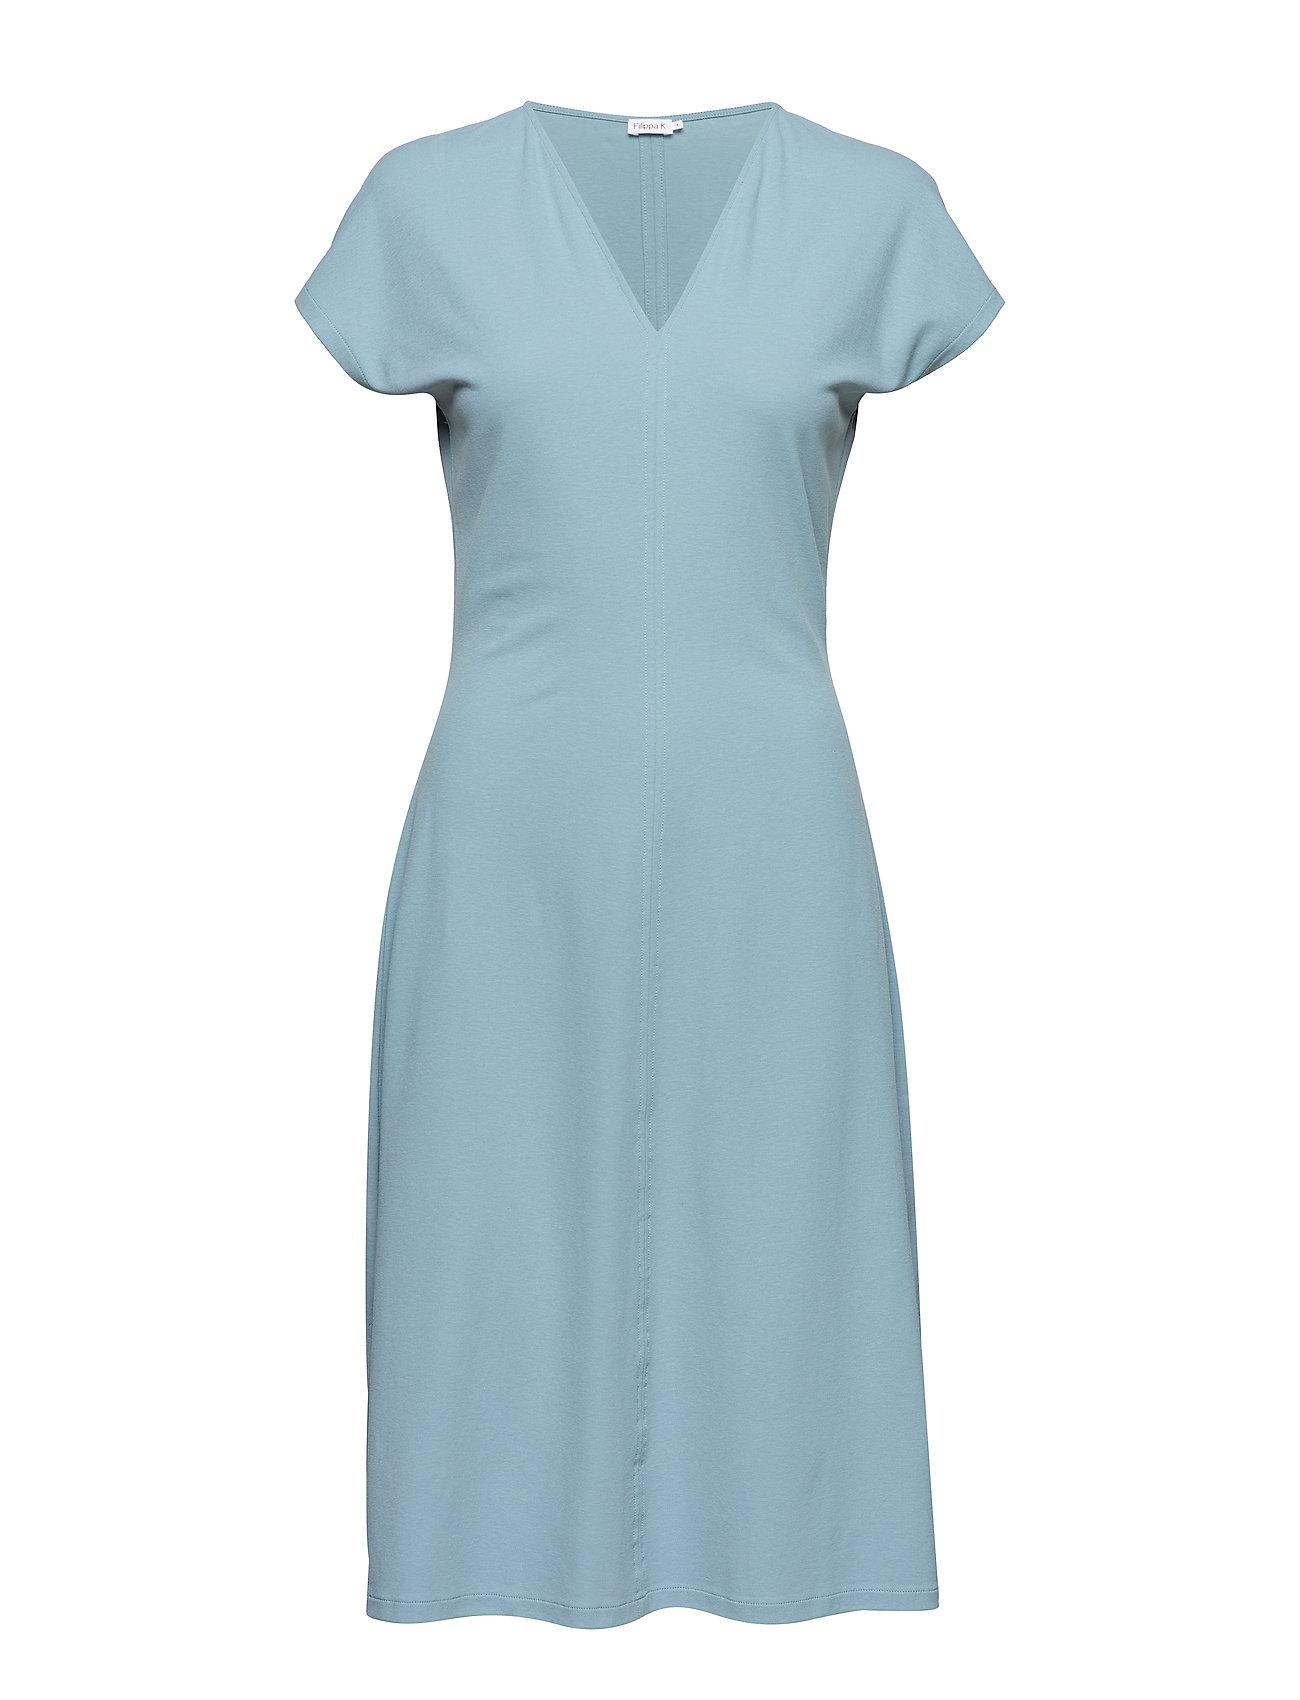 Filippa K Clean-cut Cap Sleeve Dress - KINGFISHER